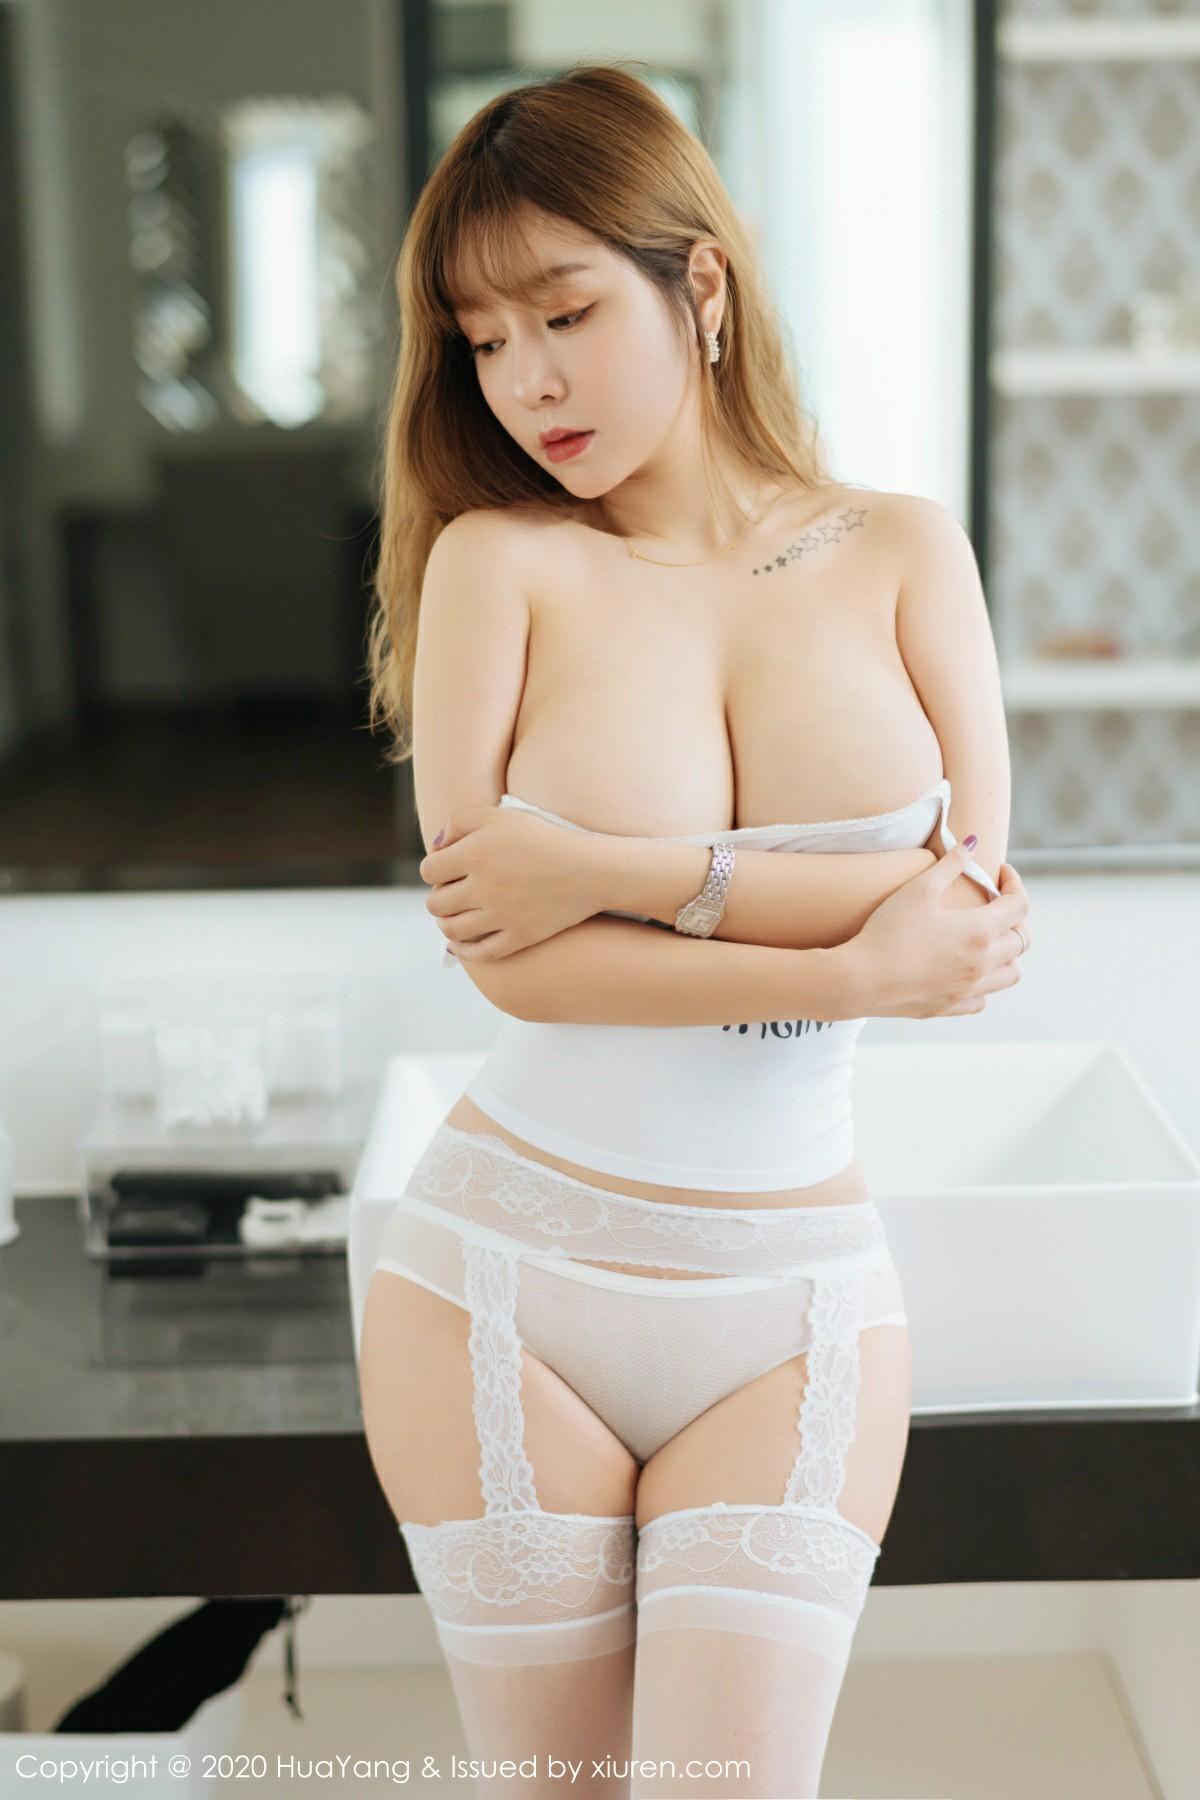 [HuaYang花漾写真]2020.03.13 VOL.227 王雨纯[73P] 花漾写真 第3张